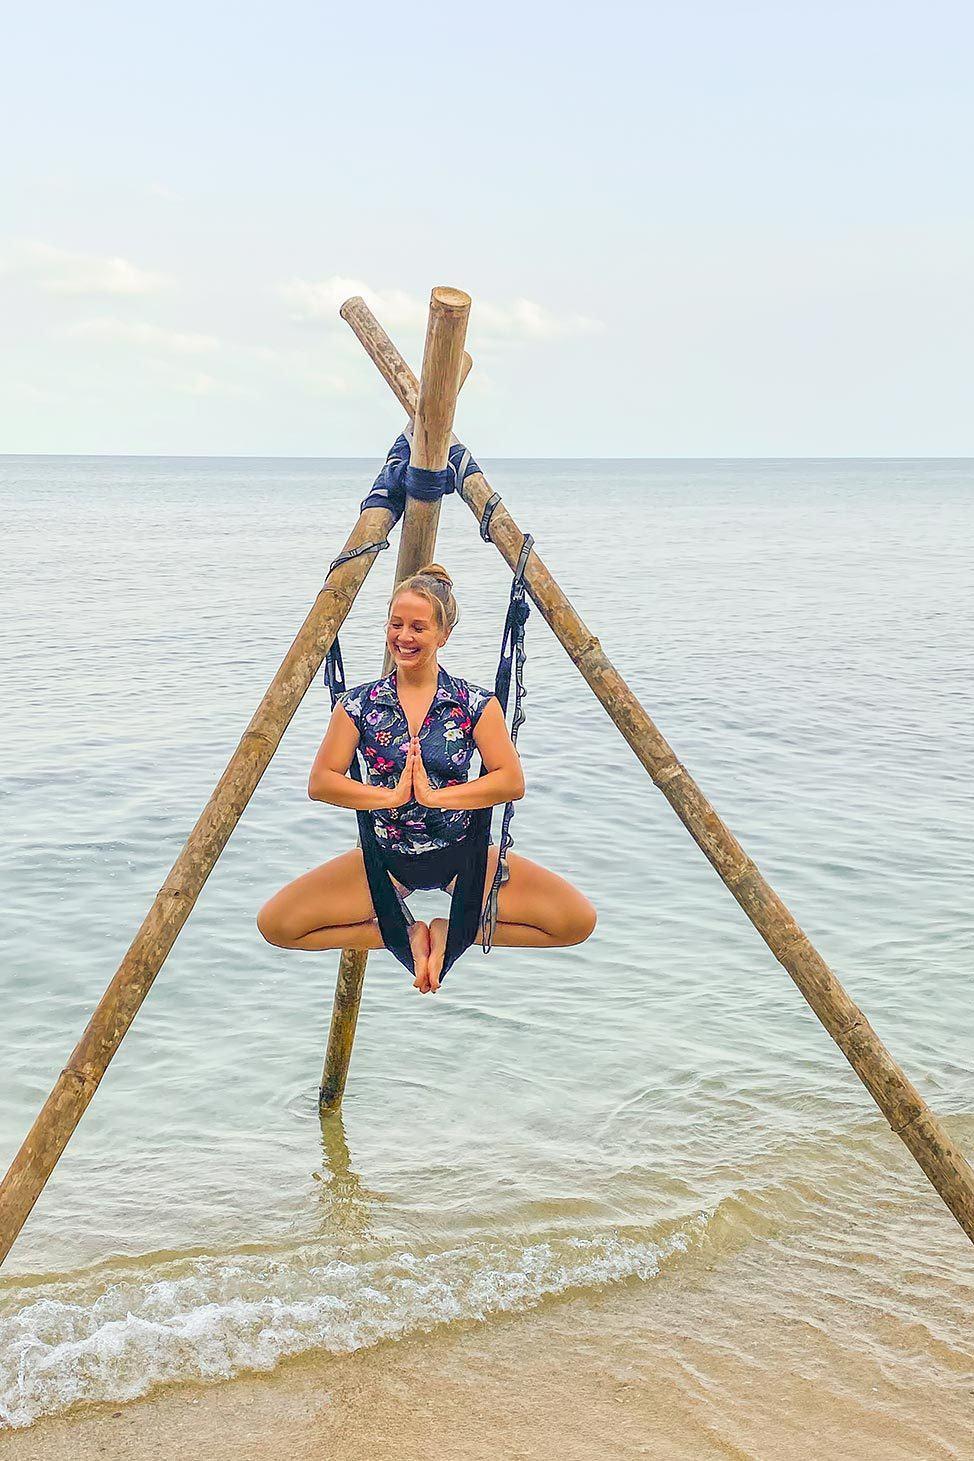 Ulu Aerial Yoga Teacher Training on the beach in Koh Phangan, Thailand